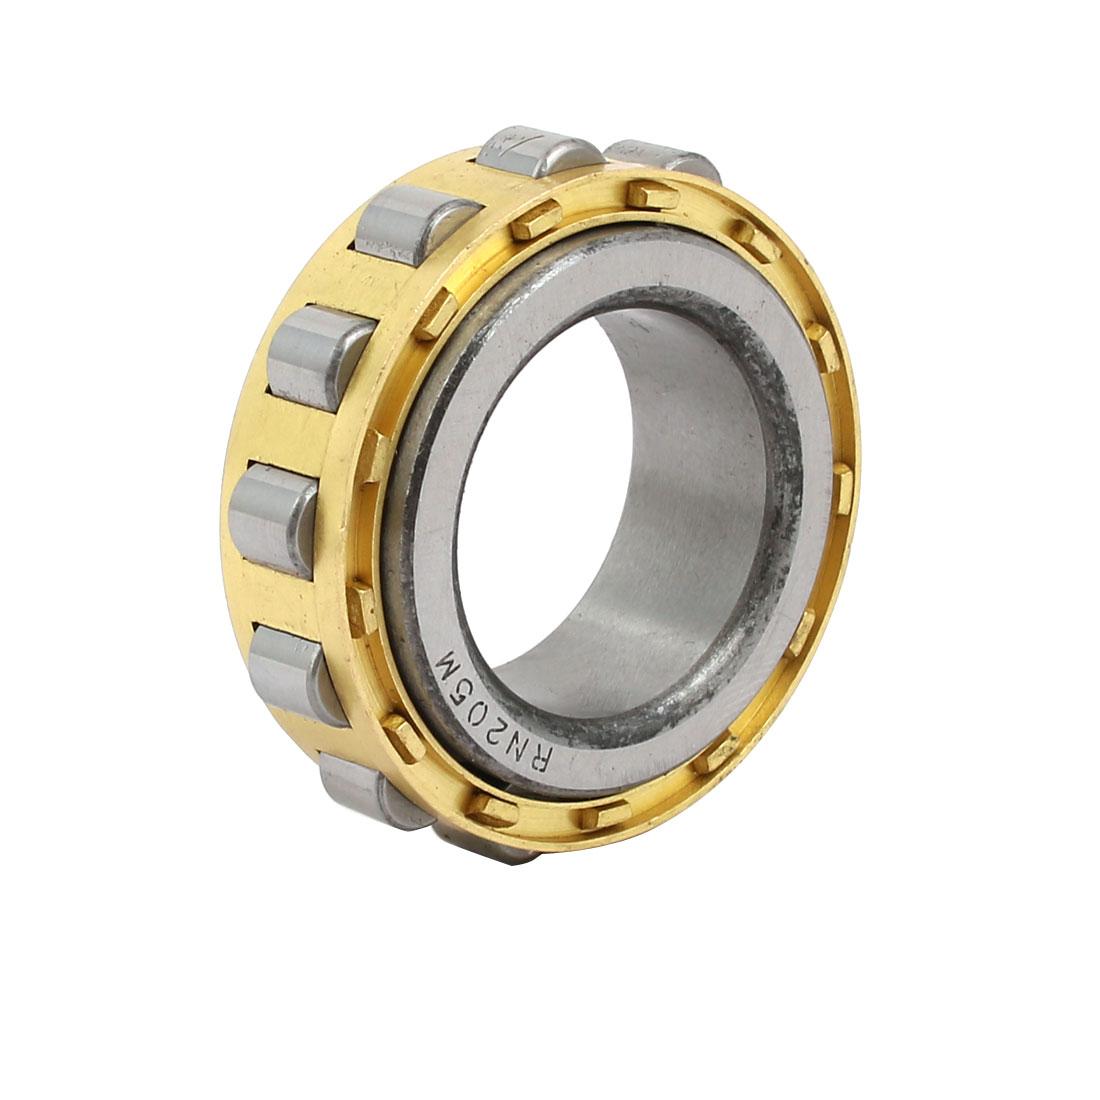 RN205EM 45mmx25mmx15mm Single Row Cylindrical Roller Bearing